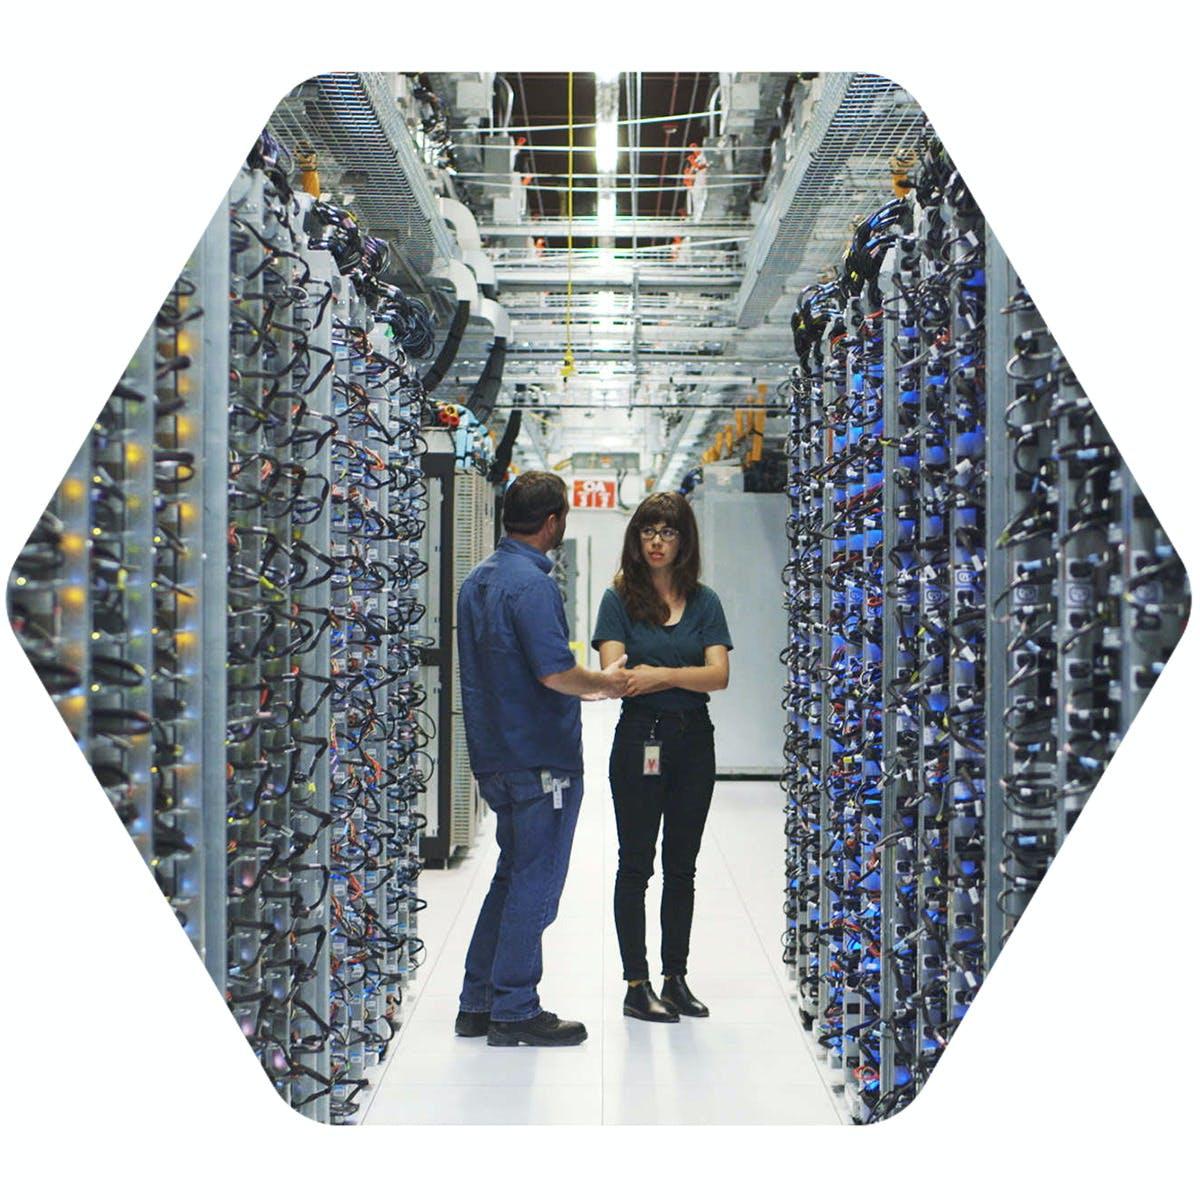 Essential Cloud Infrastructure: Foundation en Español